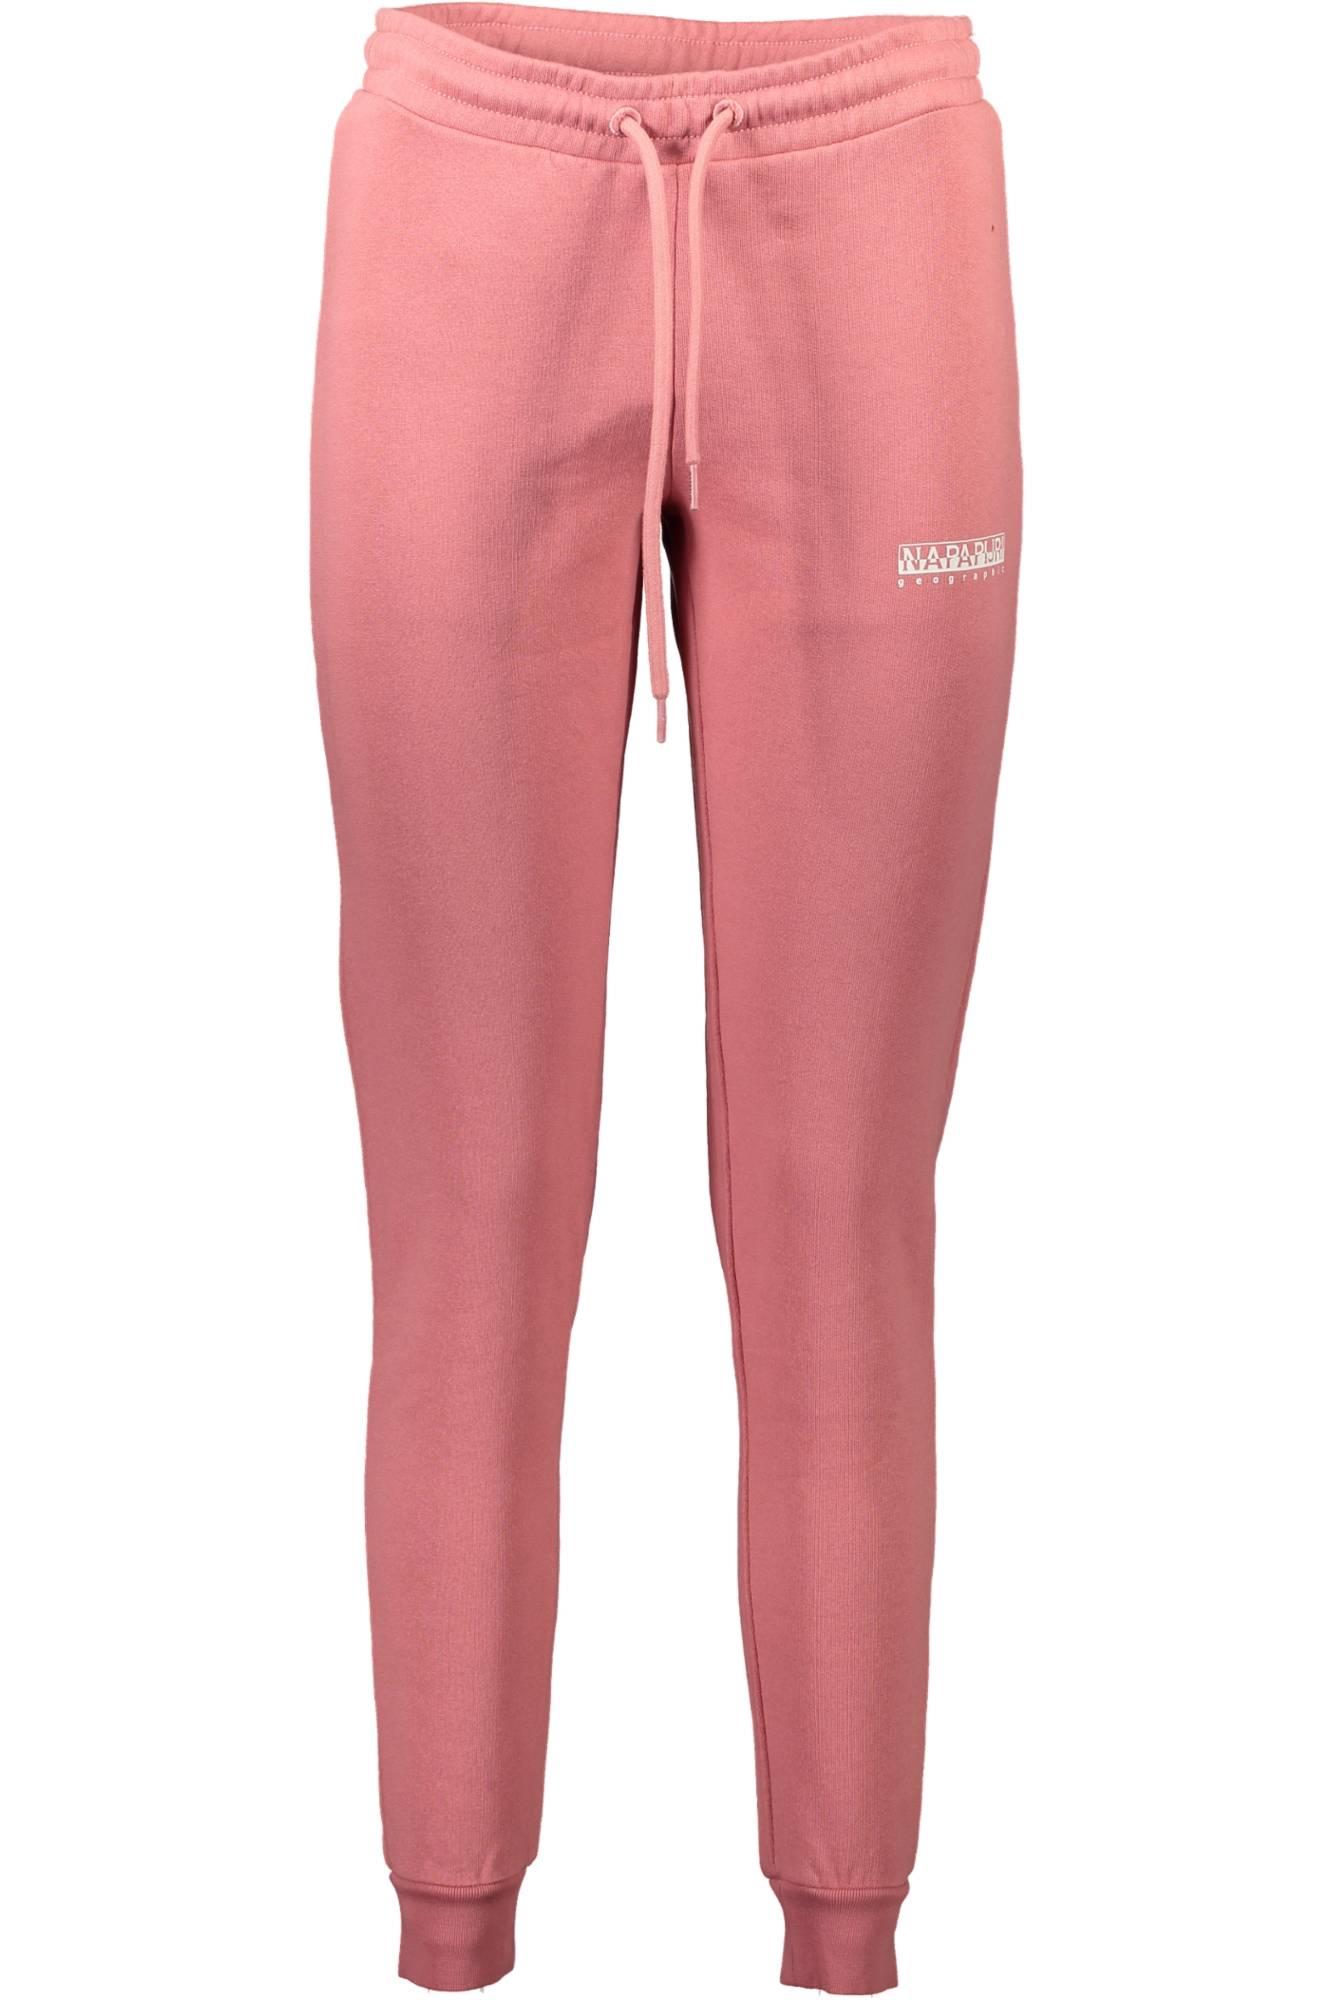 Kalhoty NAPAPIJRI kalhoty ROSA